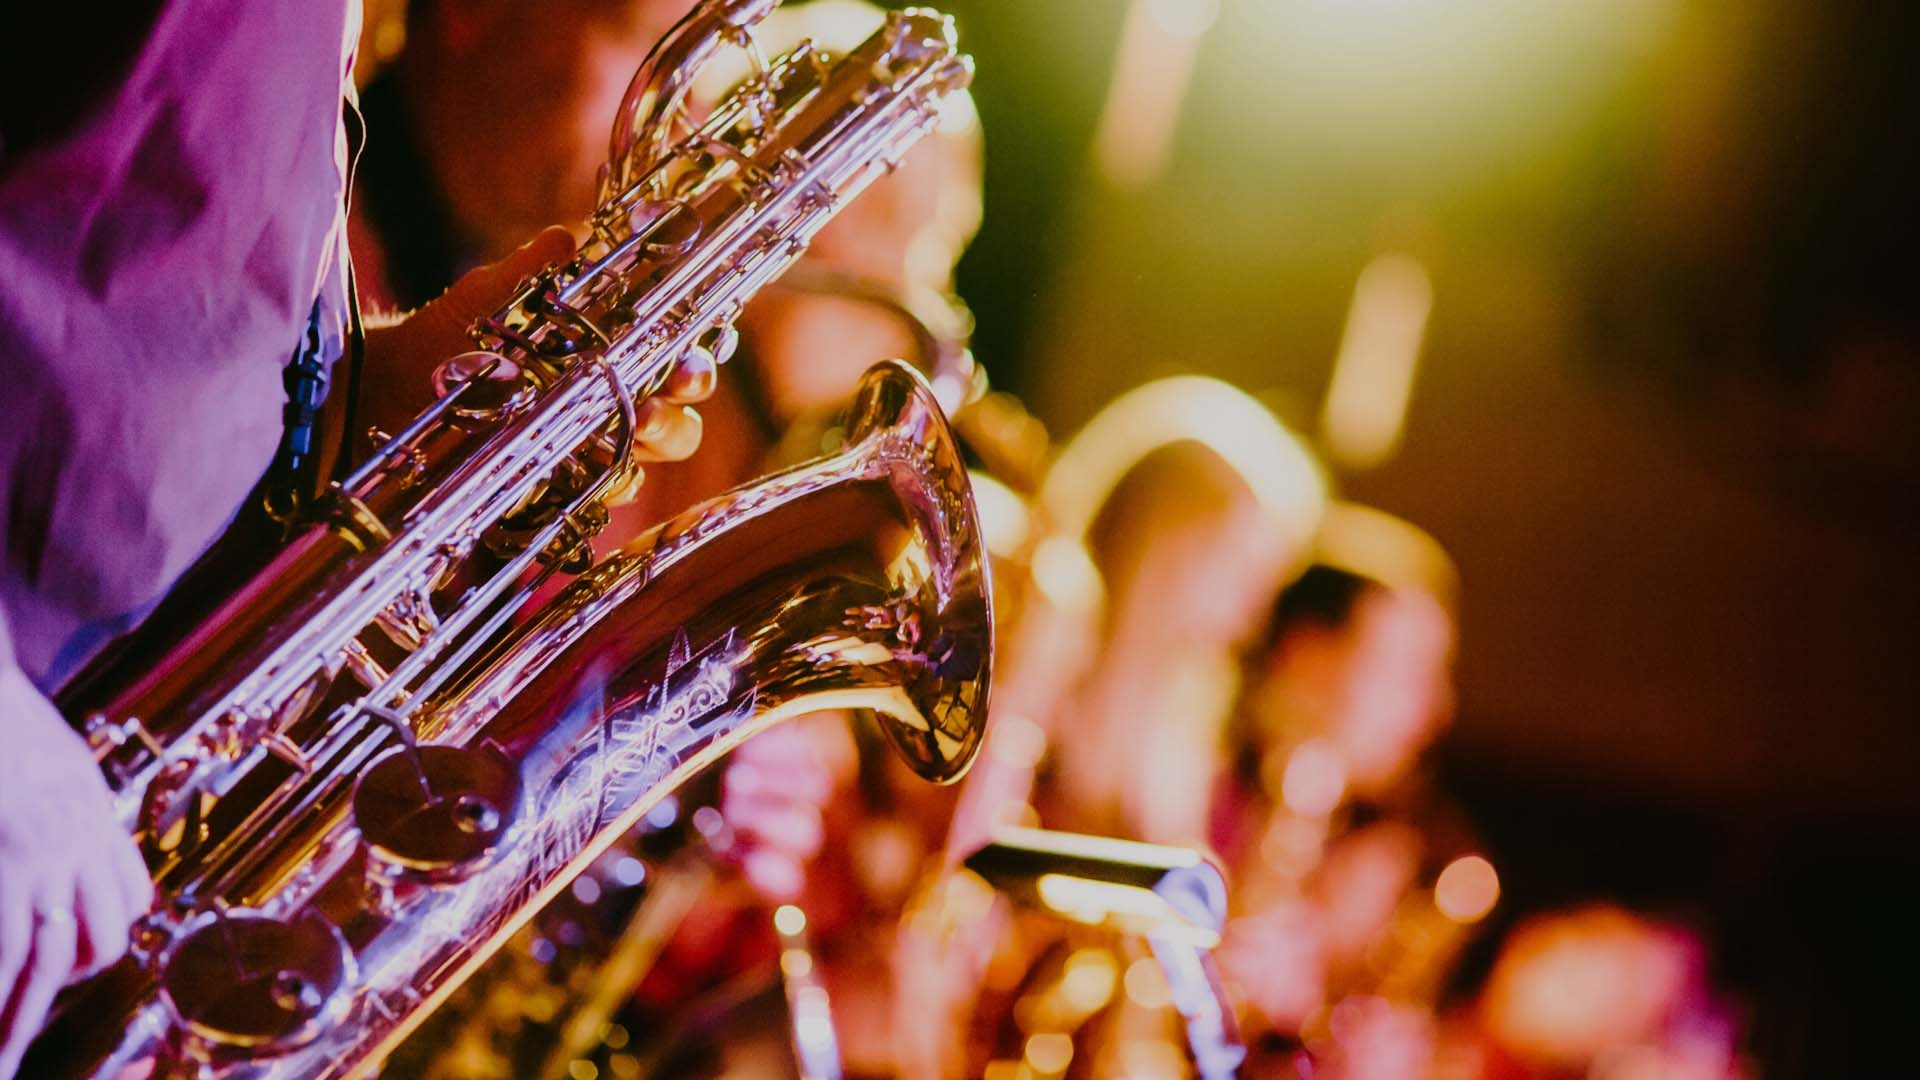 4. Međunarodni Pula Jazz Festival od 15. do 17. kolovoza